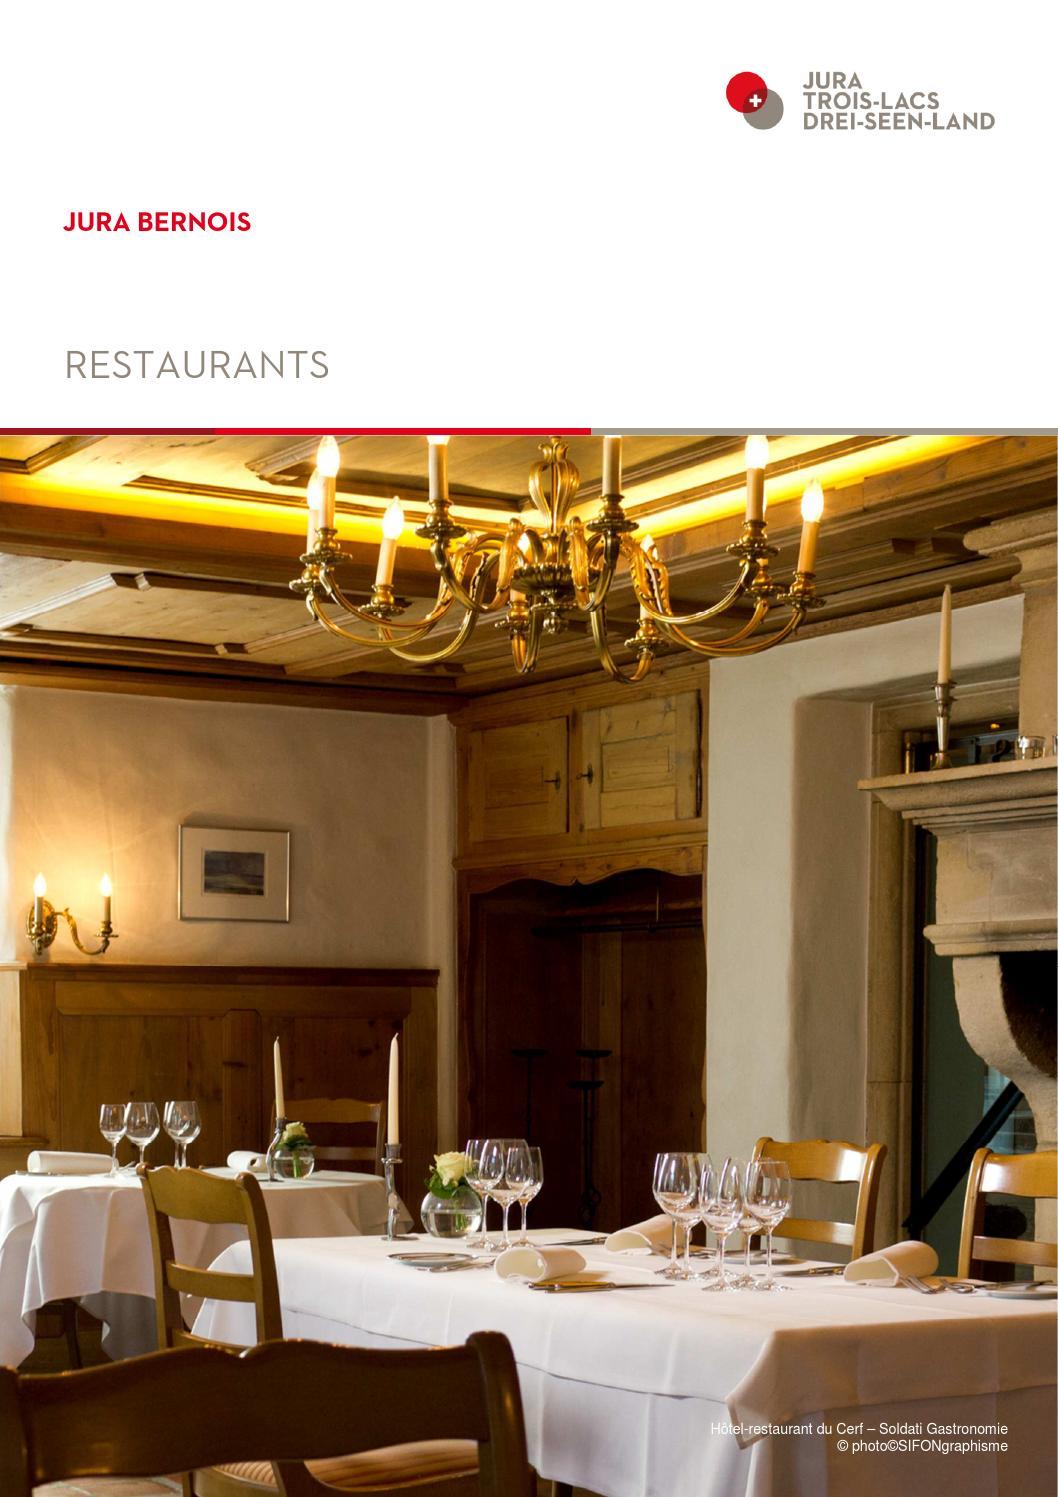 Restaurant jura bernois by madeleine issuu - Office du tourisme jura bernois ...